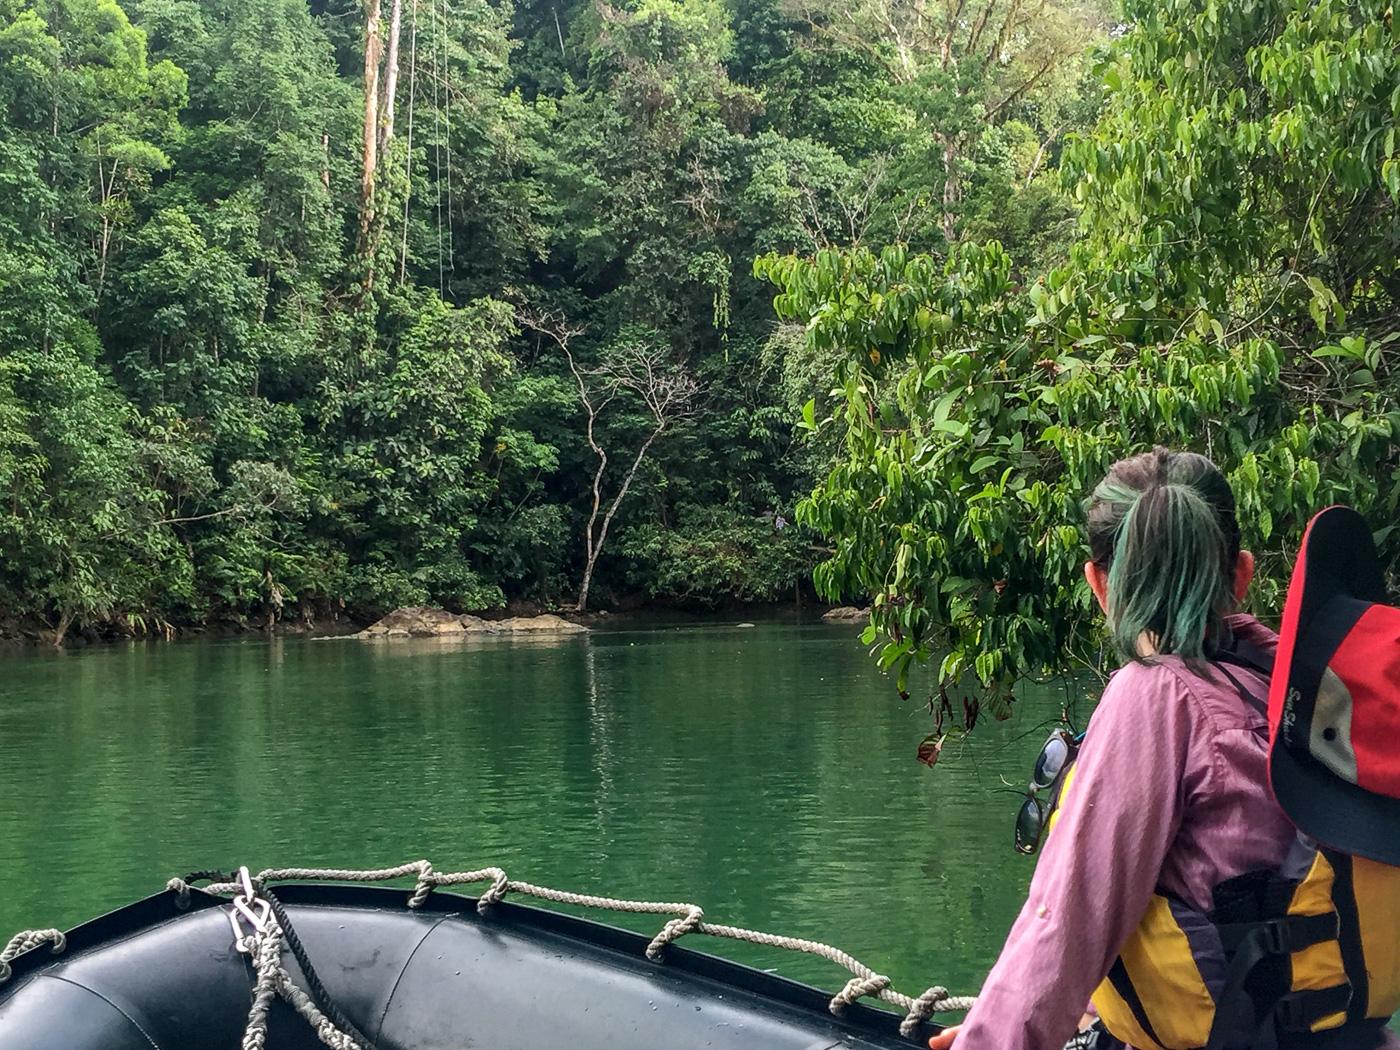 Juliana Dever skiffing Costa Rica UnCruise adventure cruise